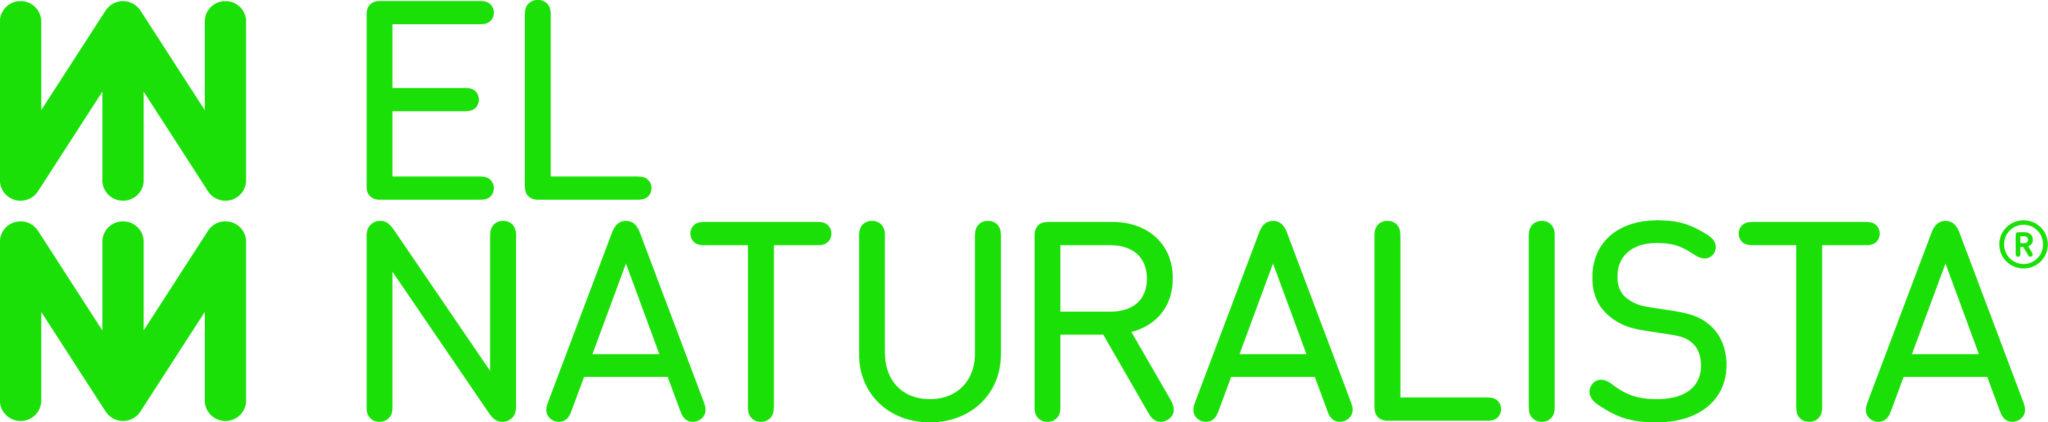 Logotipo El Naturalista